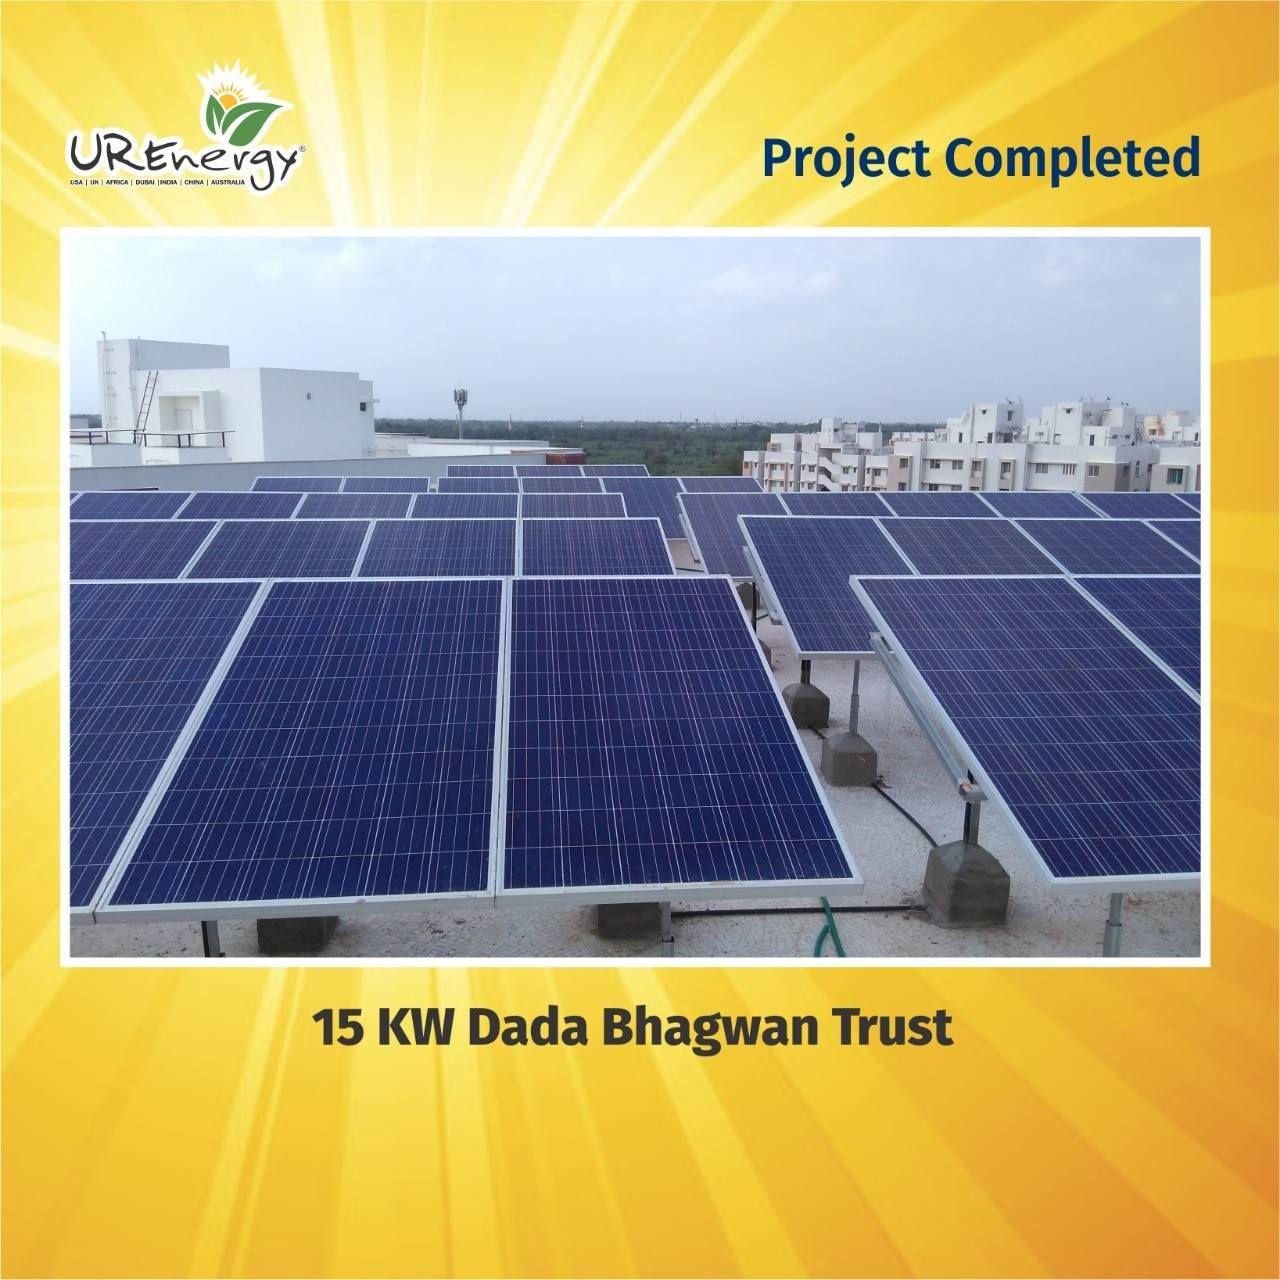 Solar Power Panel Inverters Irrigation Pumps Street Light Epc Solar Water Pump Solar Renewable Energy Companies